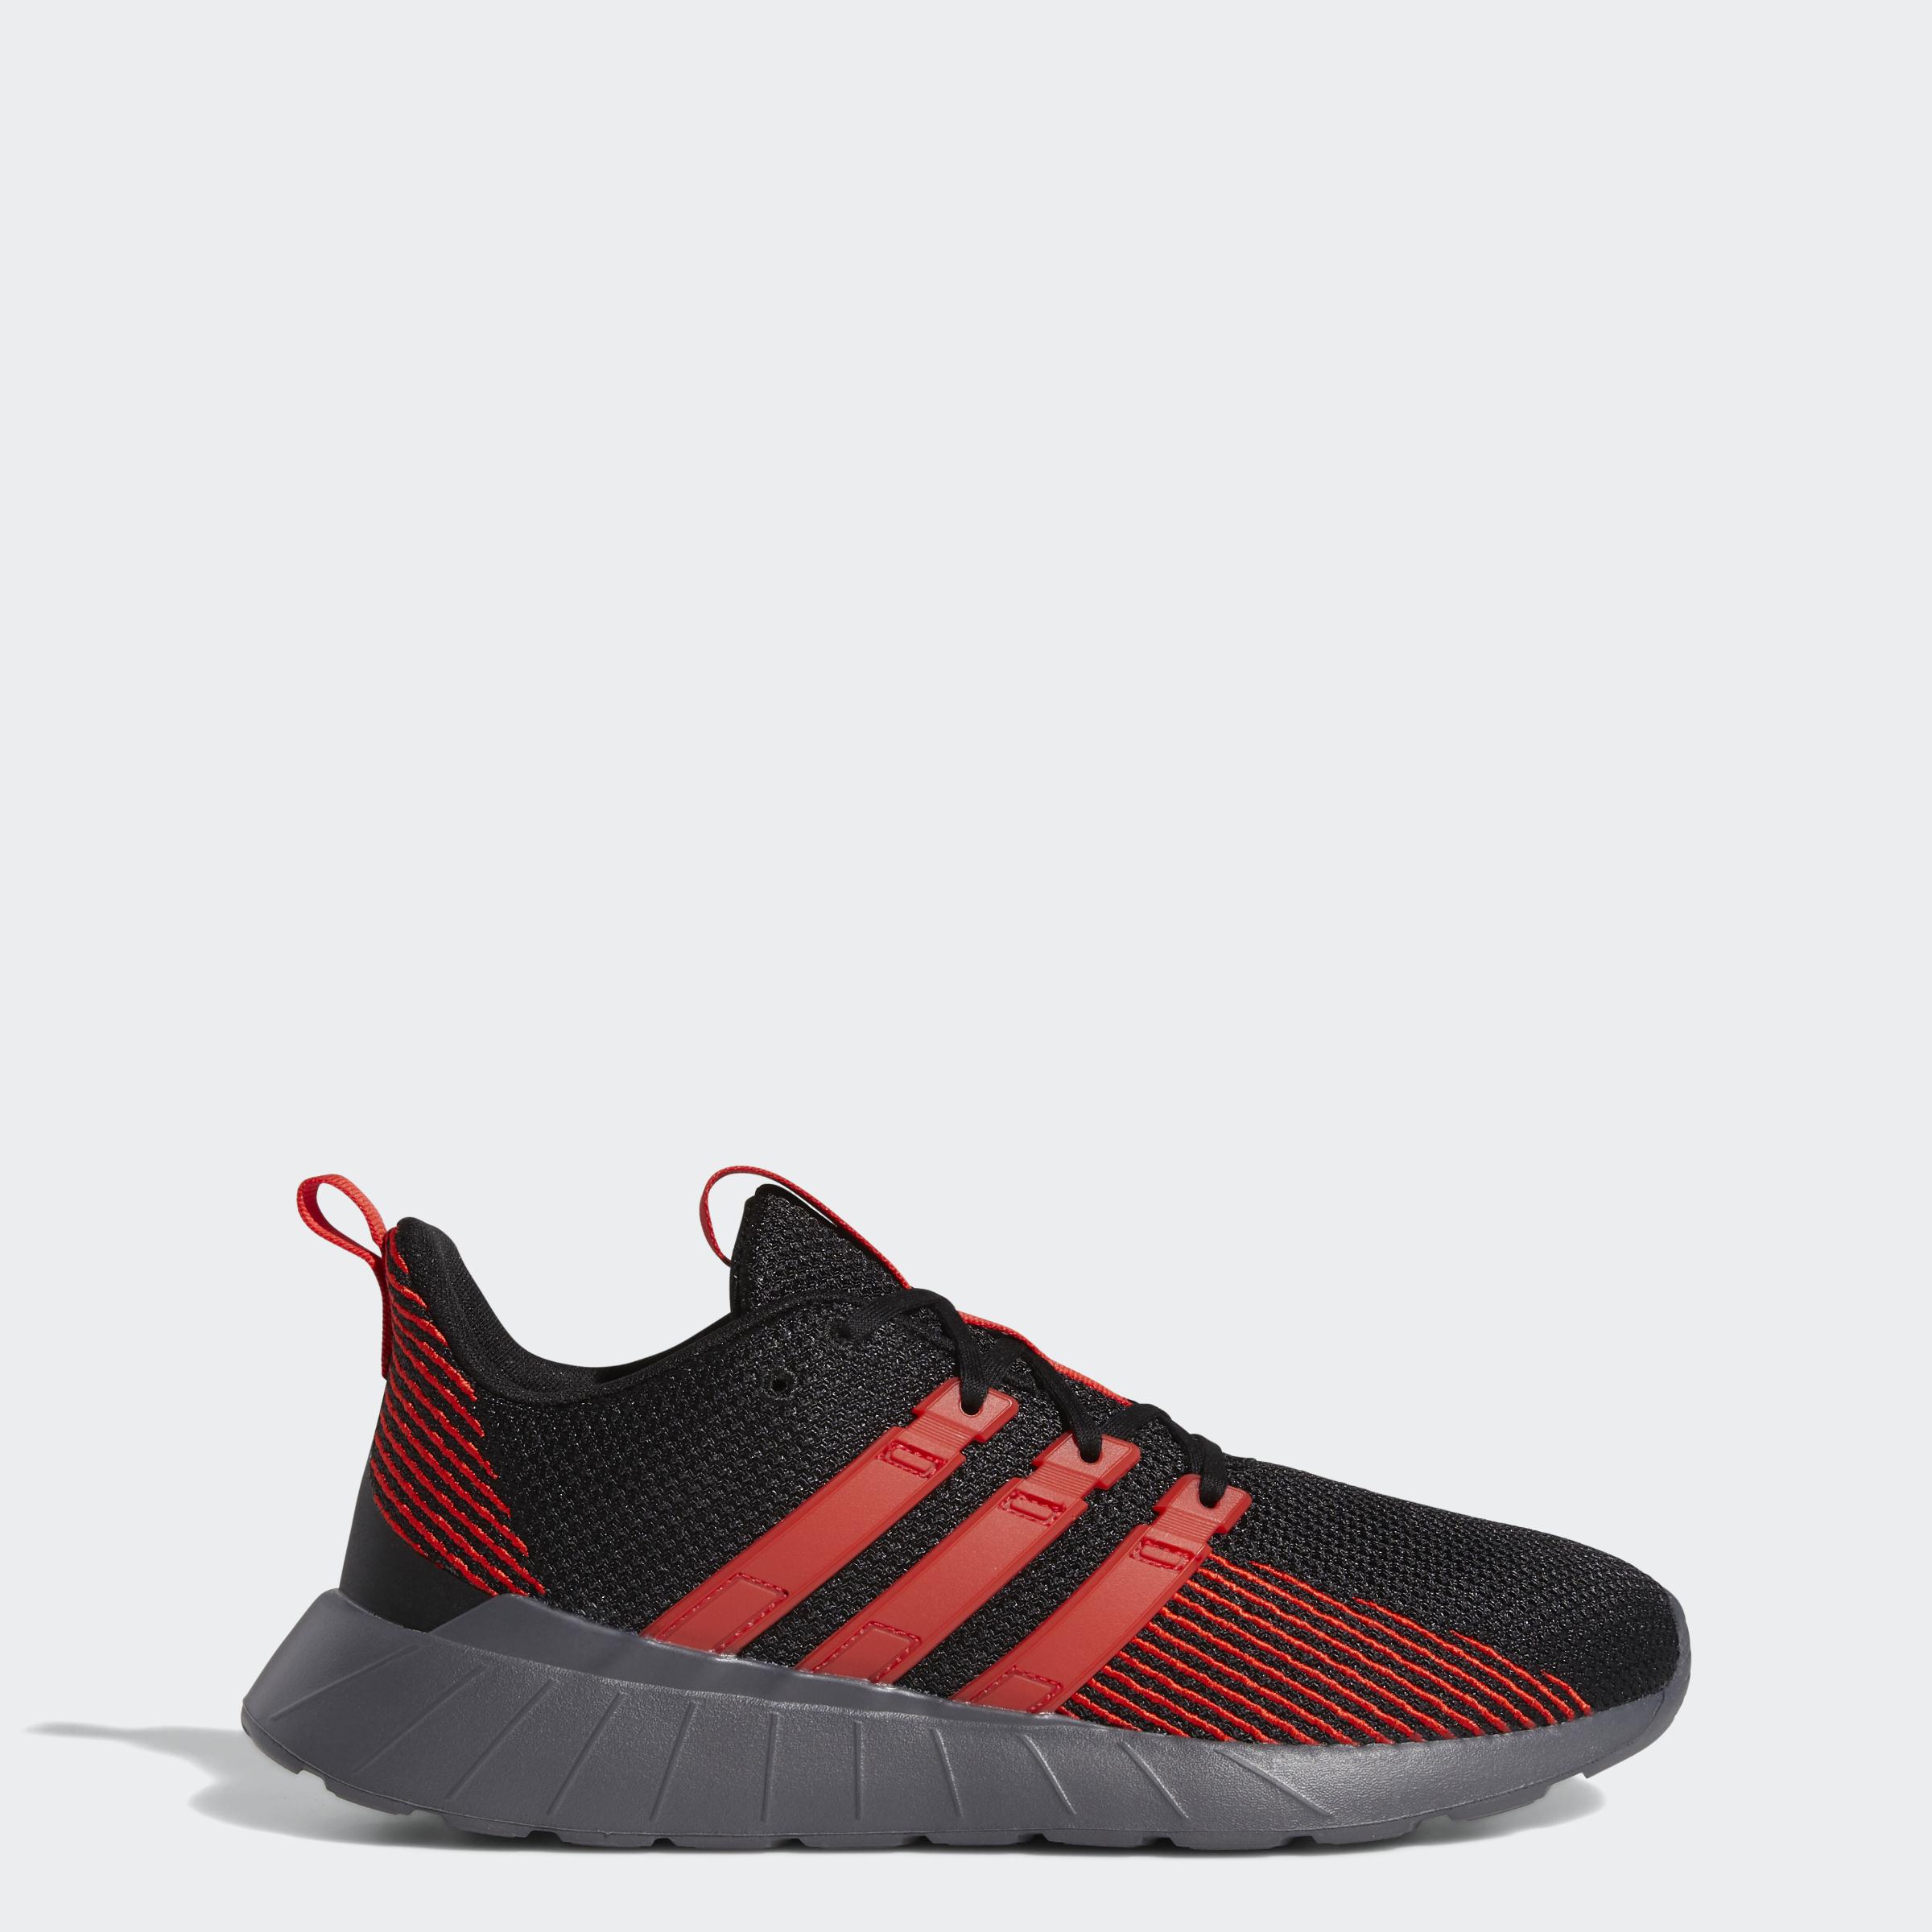 adidas-Questar-Flow-Shoes-Men-039-s thumbnail 10